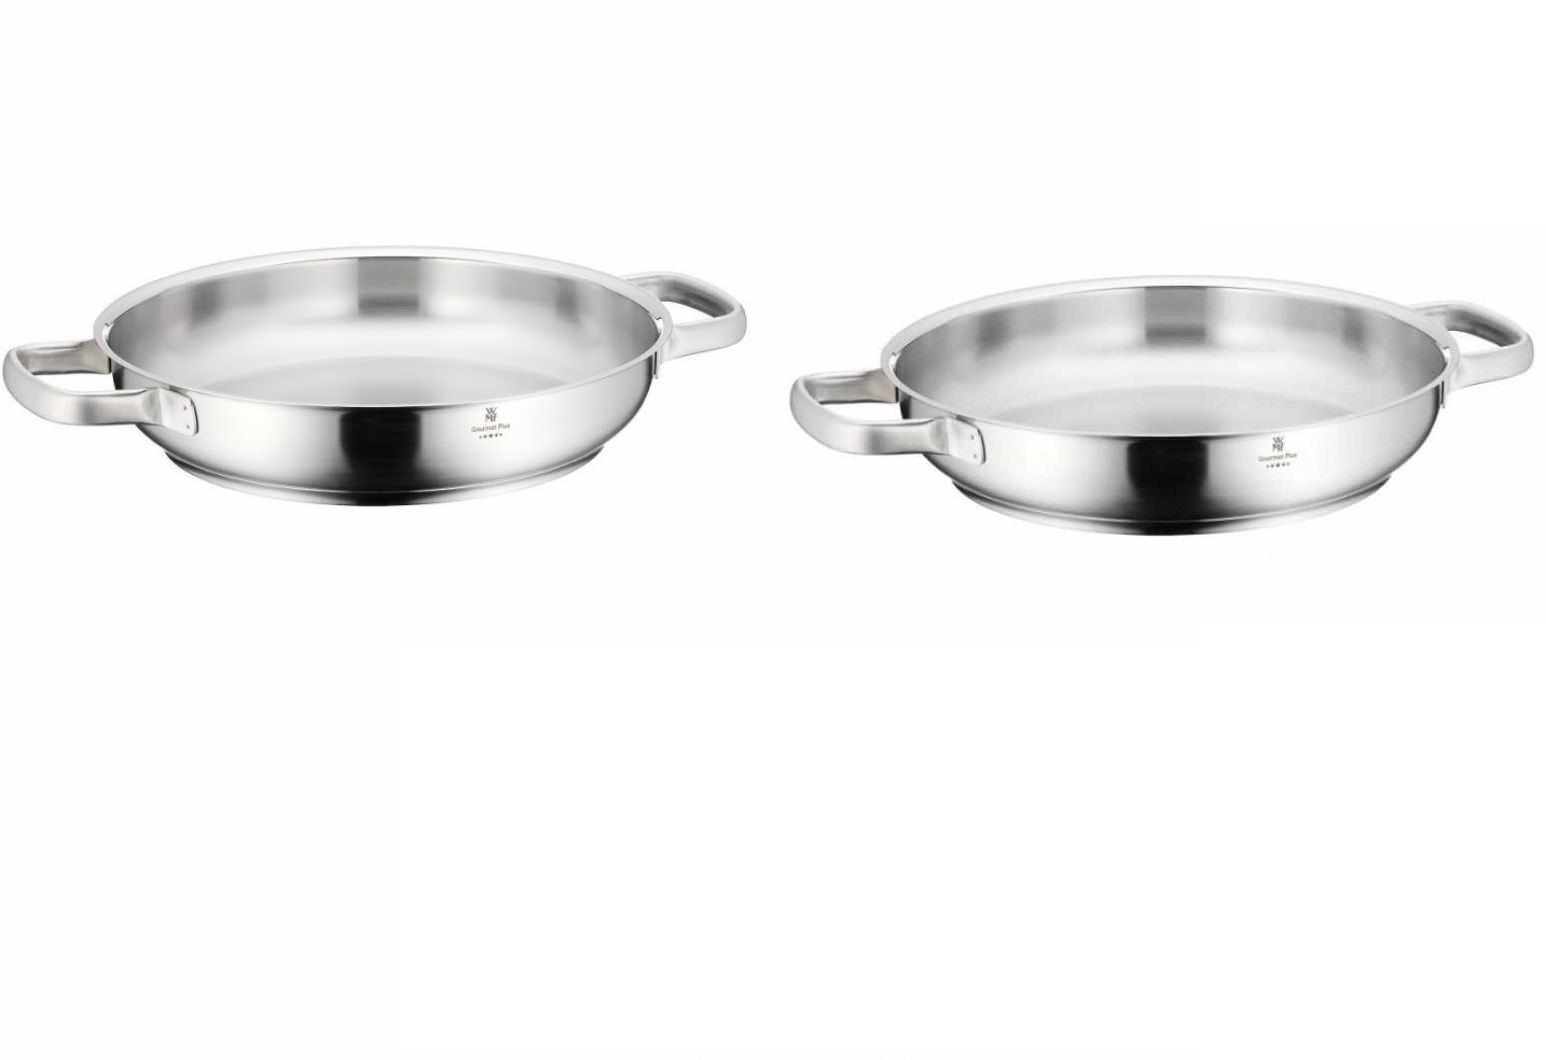 Сковорода WMF GOURMET PLUS, диаметр 28 см, серебристый WMF 07 2628 6031 фото 2